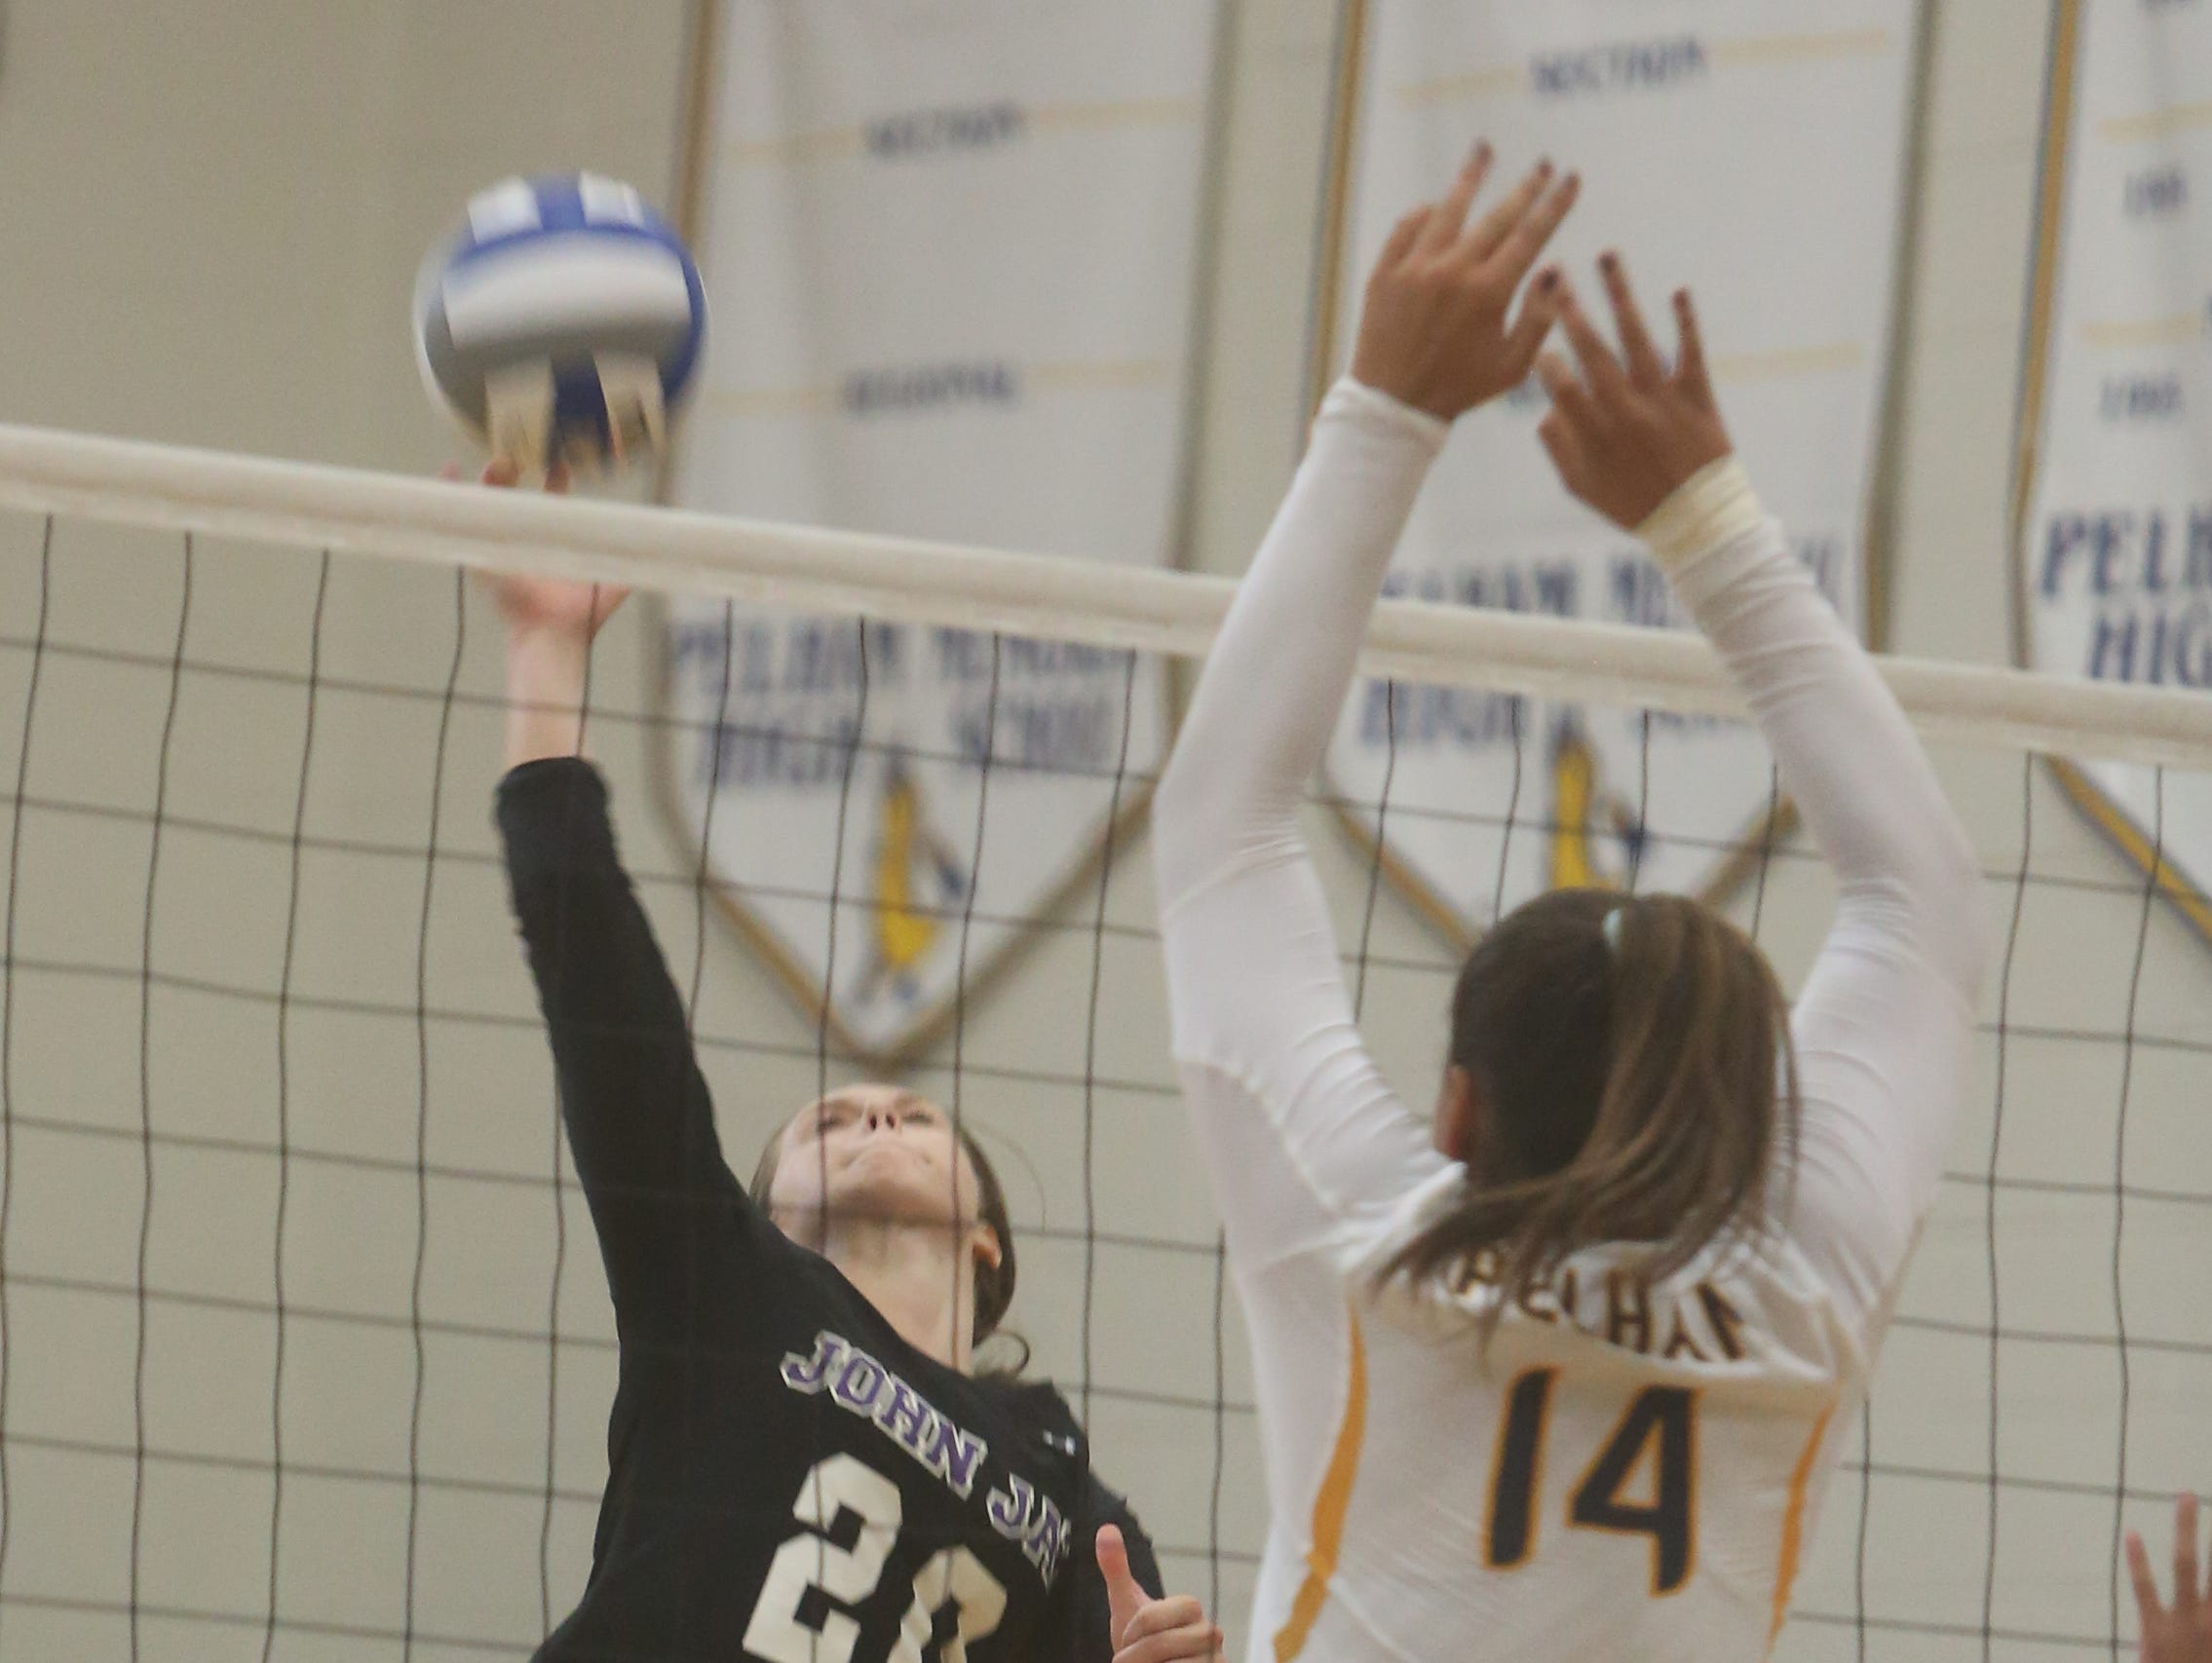 John Jay and Pelham battled in a varsity volleyball match at Pelham High School Sept. 3, 2015.